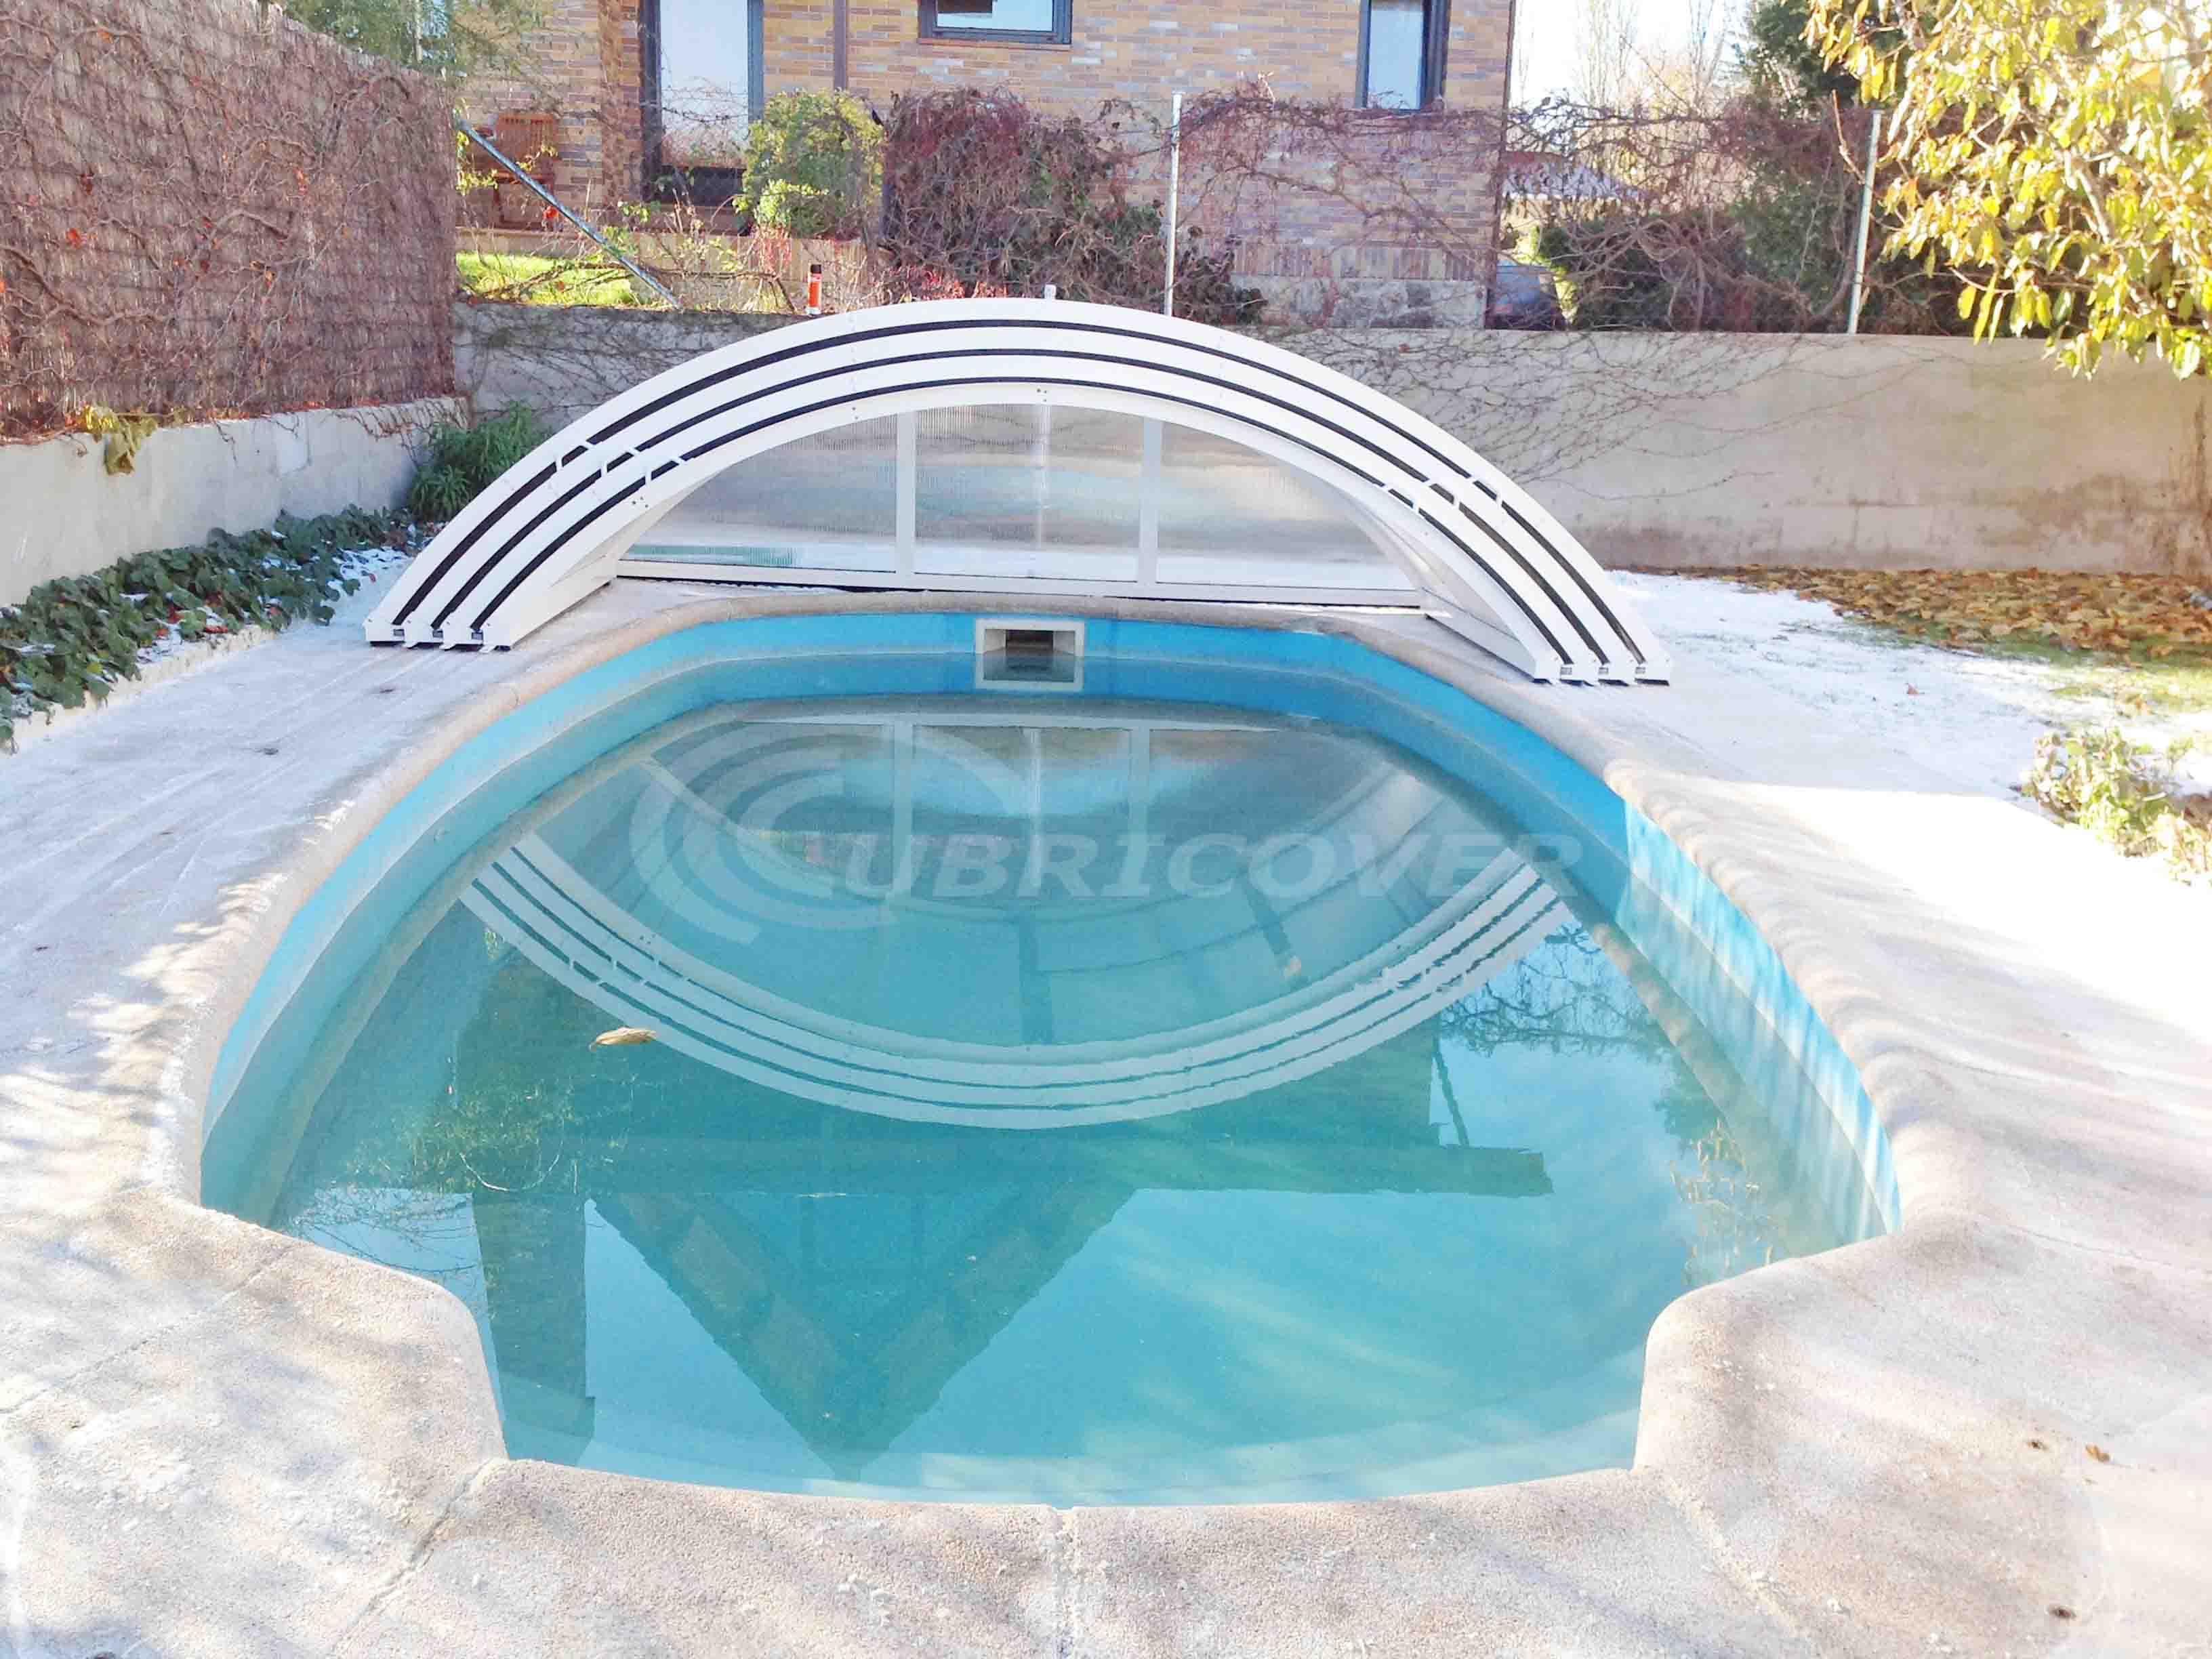 Cubierta para piscina baja telesc pica cubricover for Piscina guadarrama